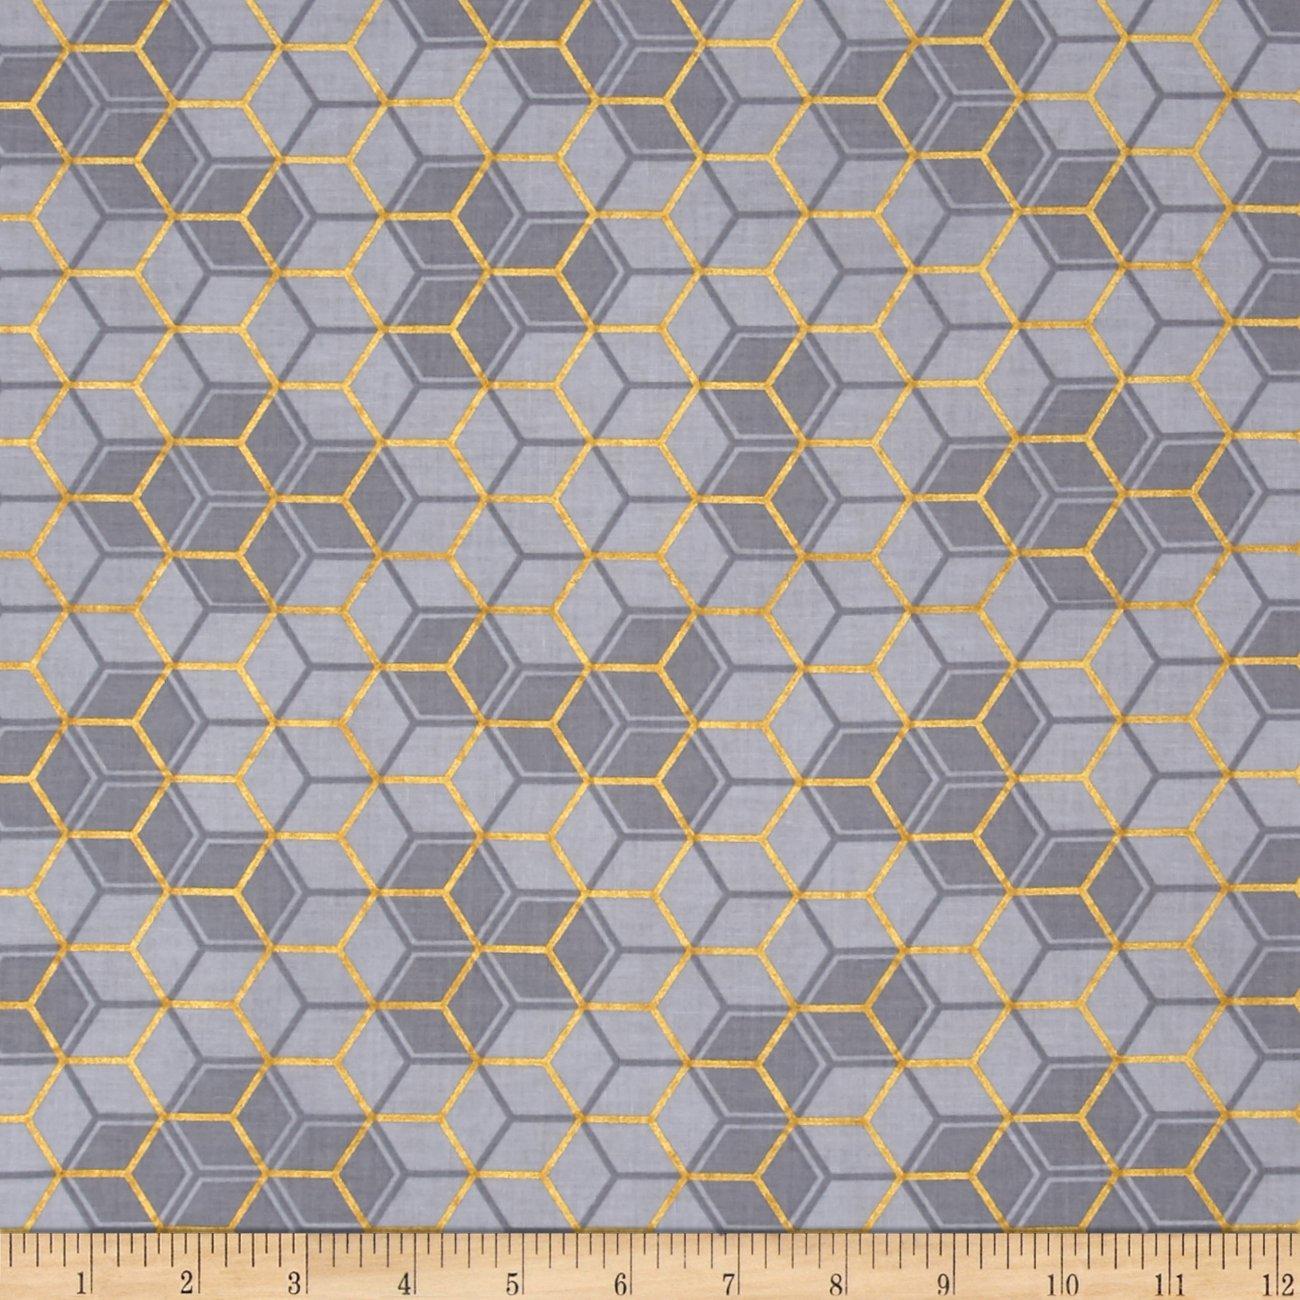 Clarabelle - Gray/Gold Geometric